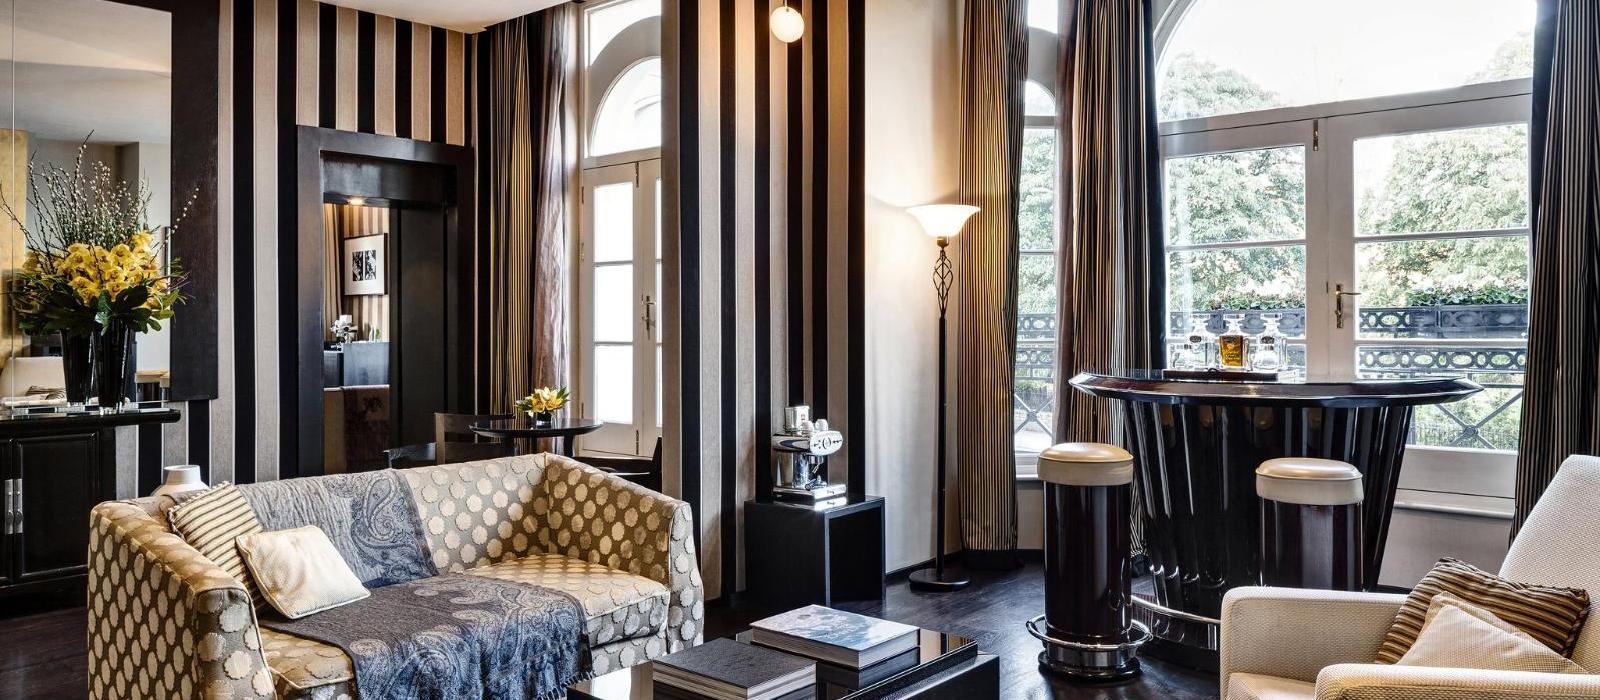 伦敦巴廖尼酒店(Baglioni Hotel London) 图片  www.lhw.cn